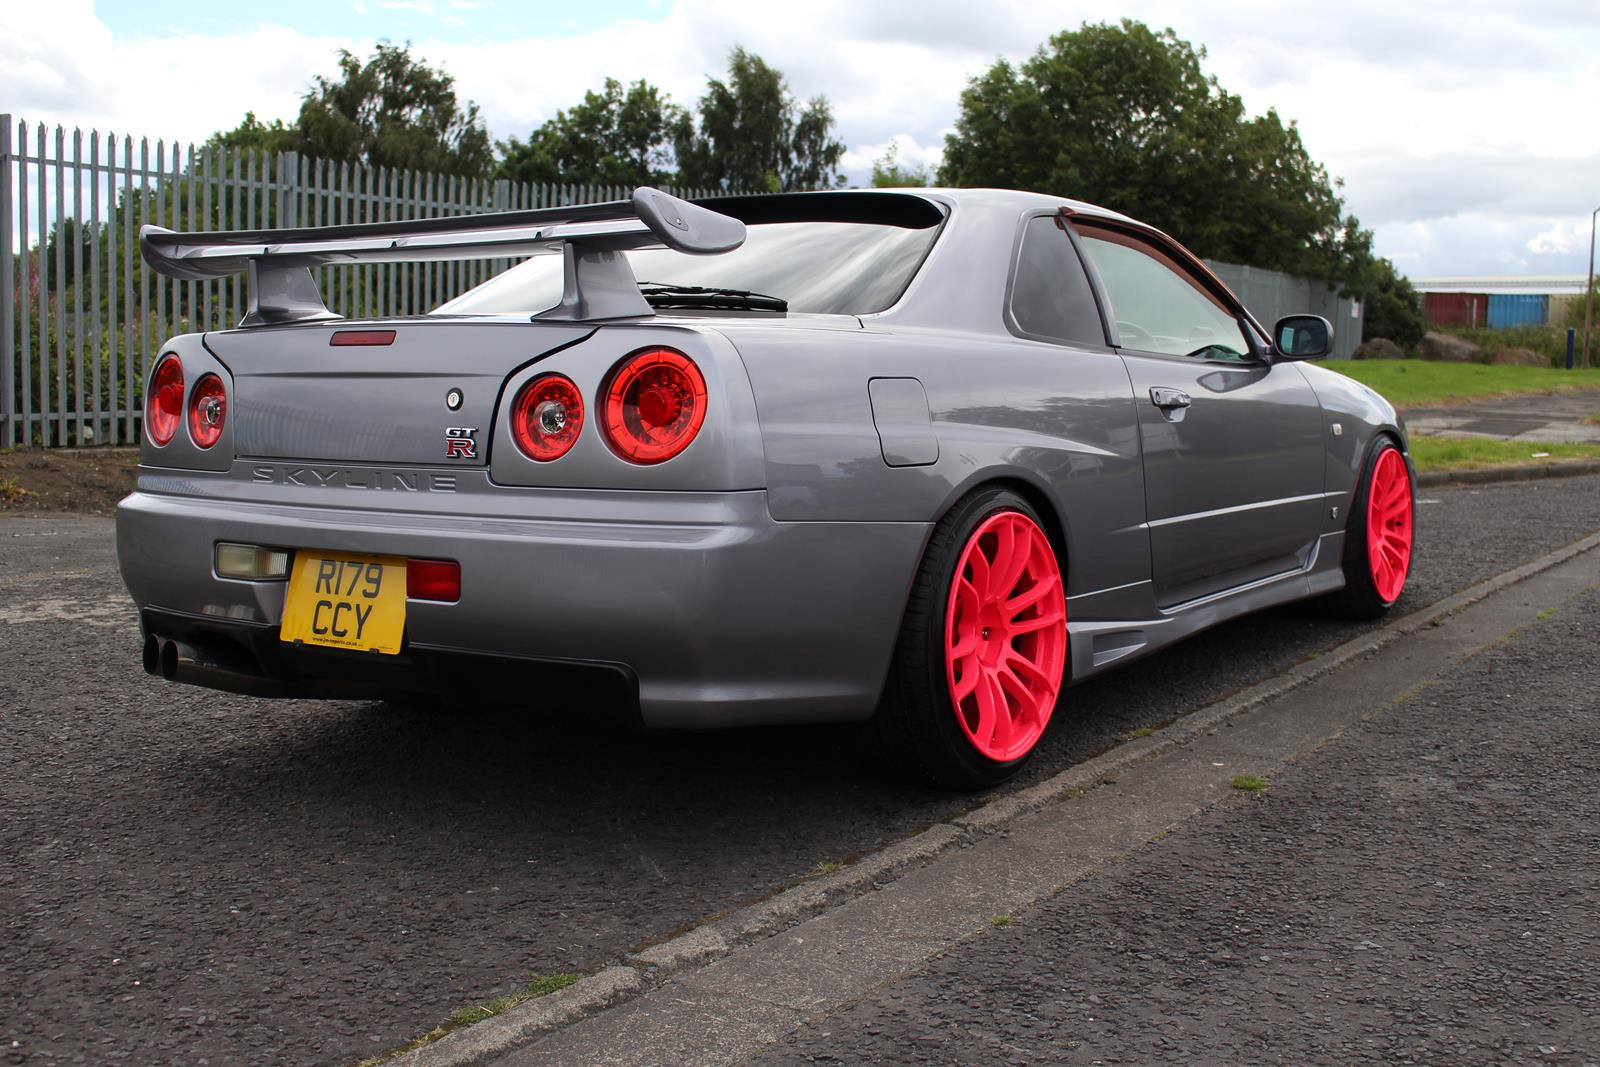 Nissan Gtr Interior >> 1998 Nissan Skyline R34 GT-T 400PS GTR Front - JM-Imports